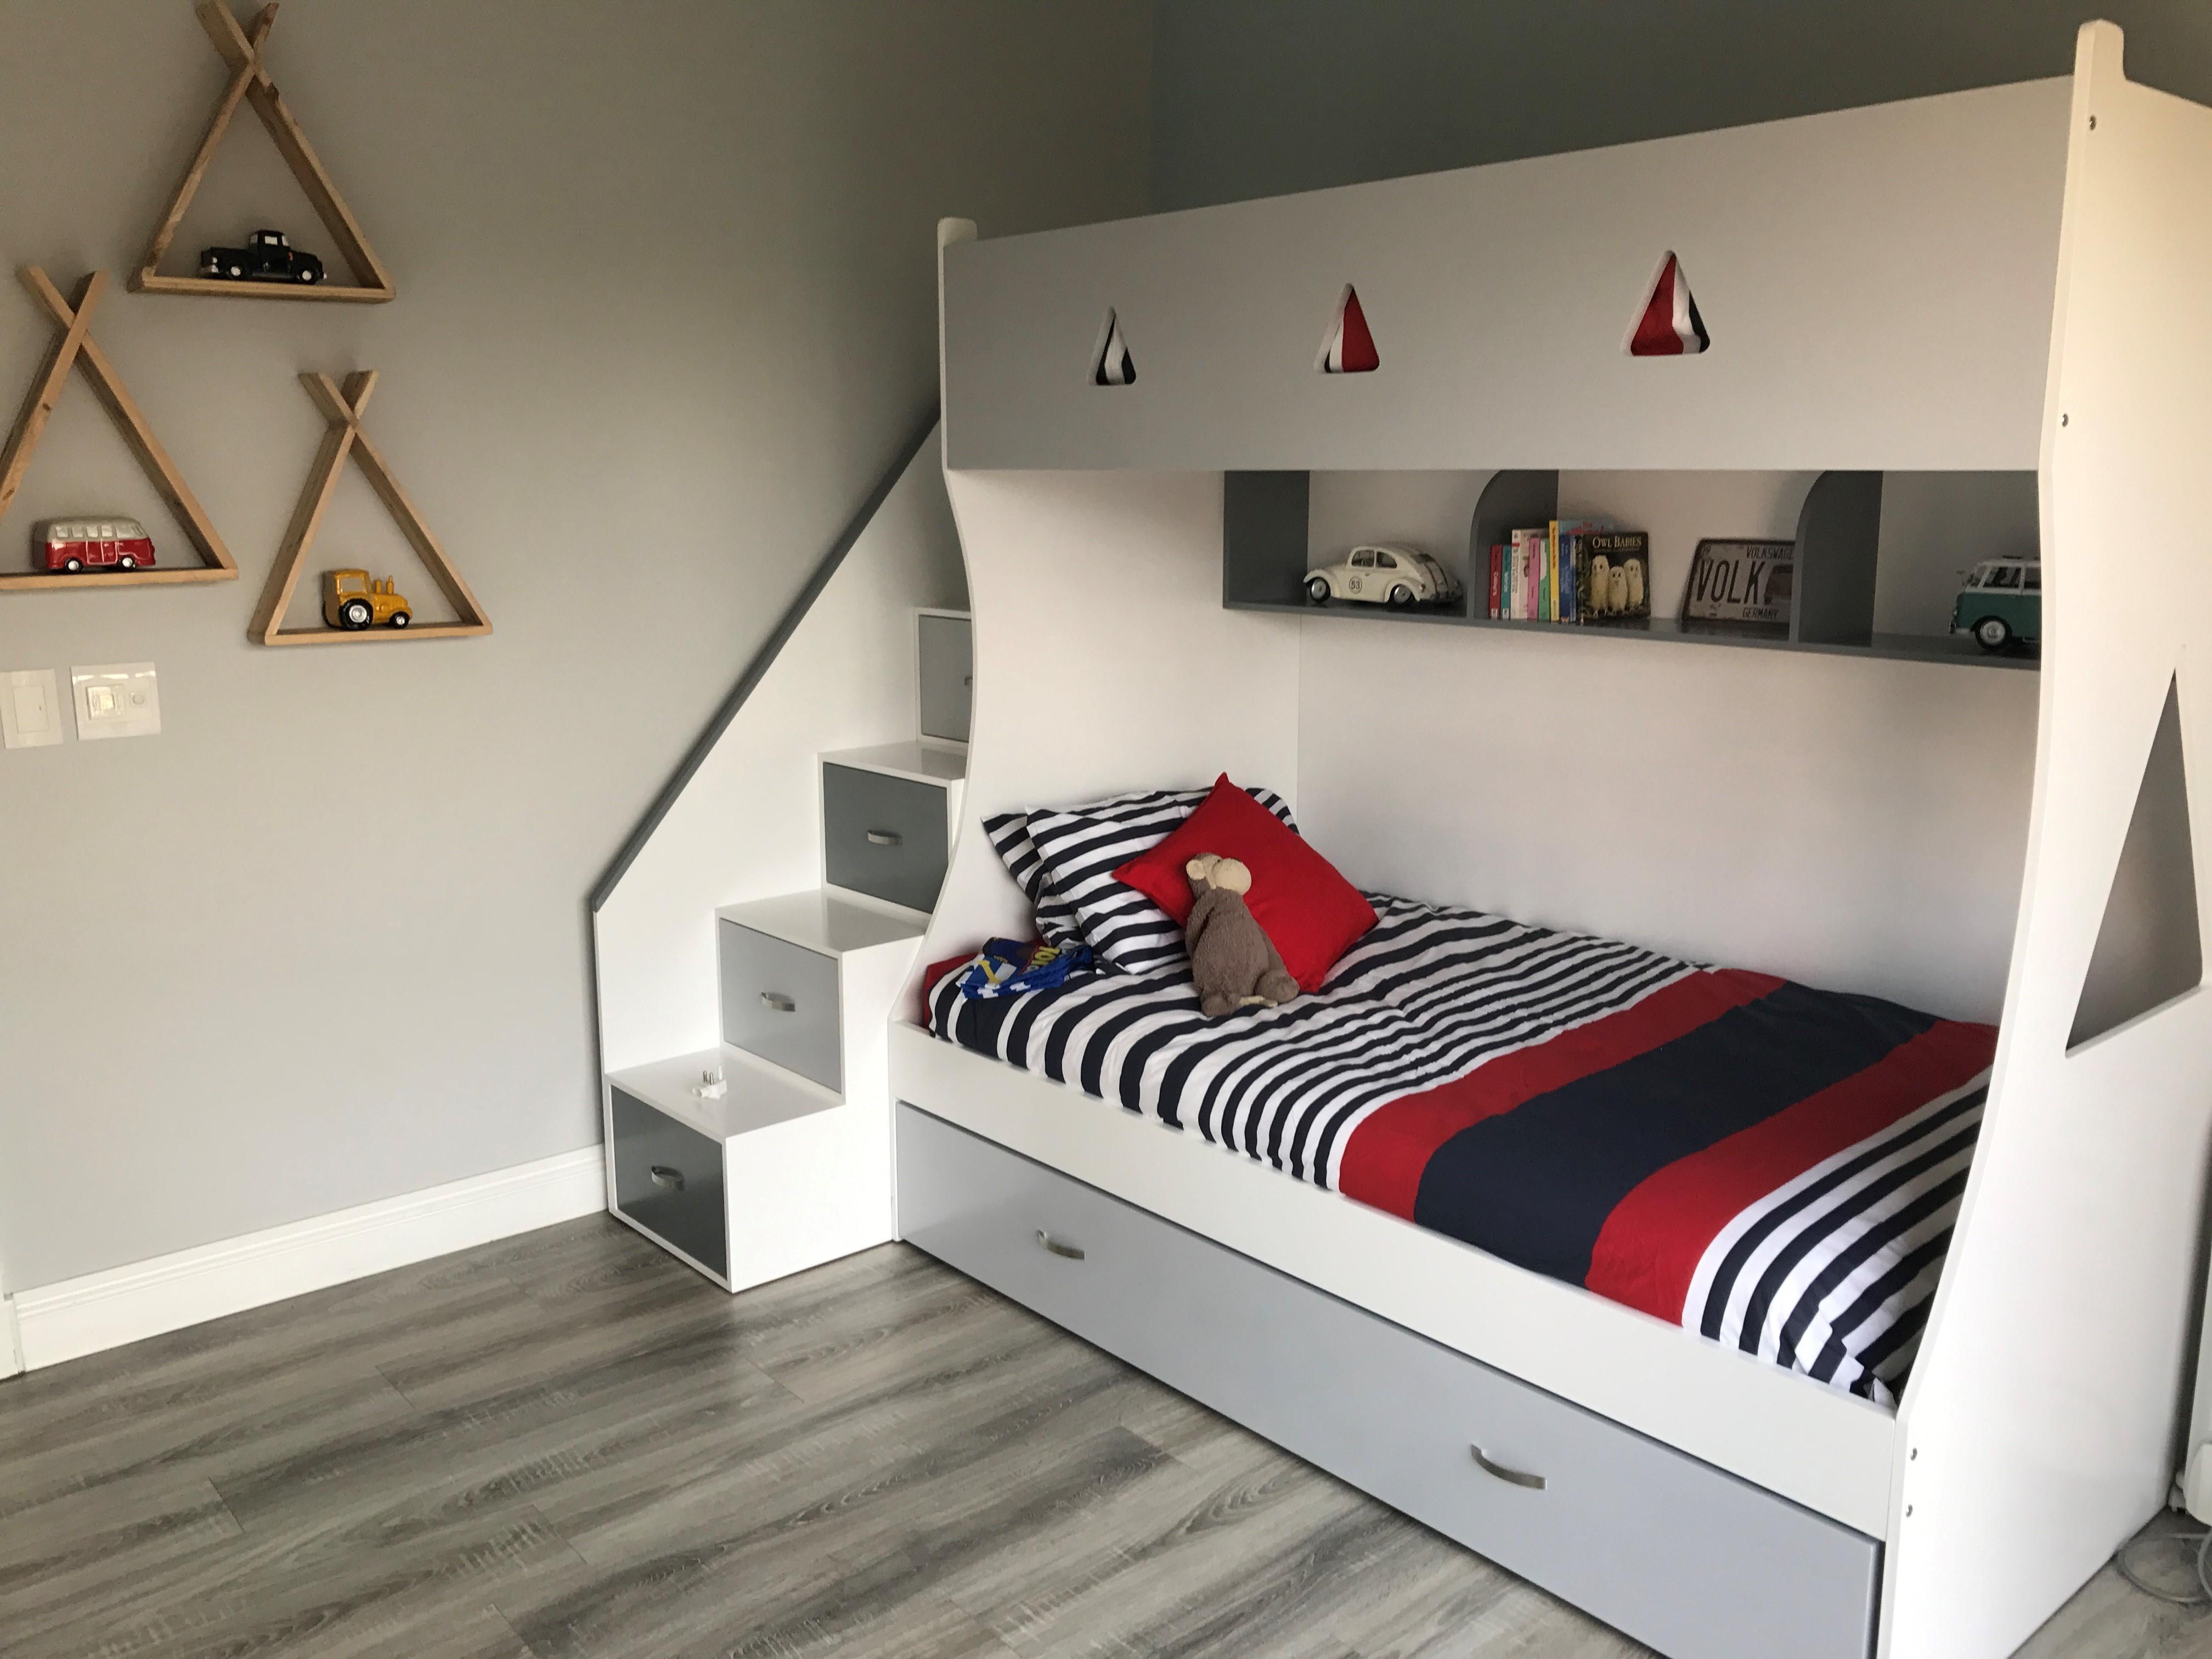 Bedroom Furniture Manufacturers List, Bedroom Furniture Manufacturers List Suppliers and Manufacturers at Alibaba